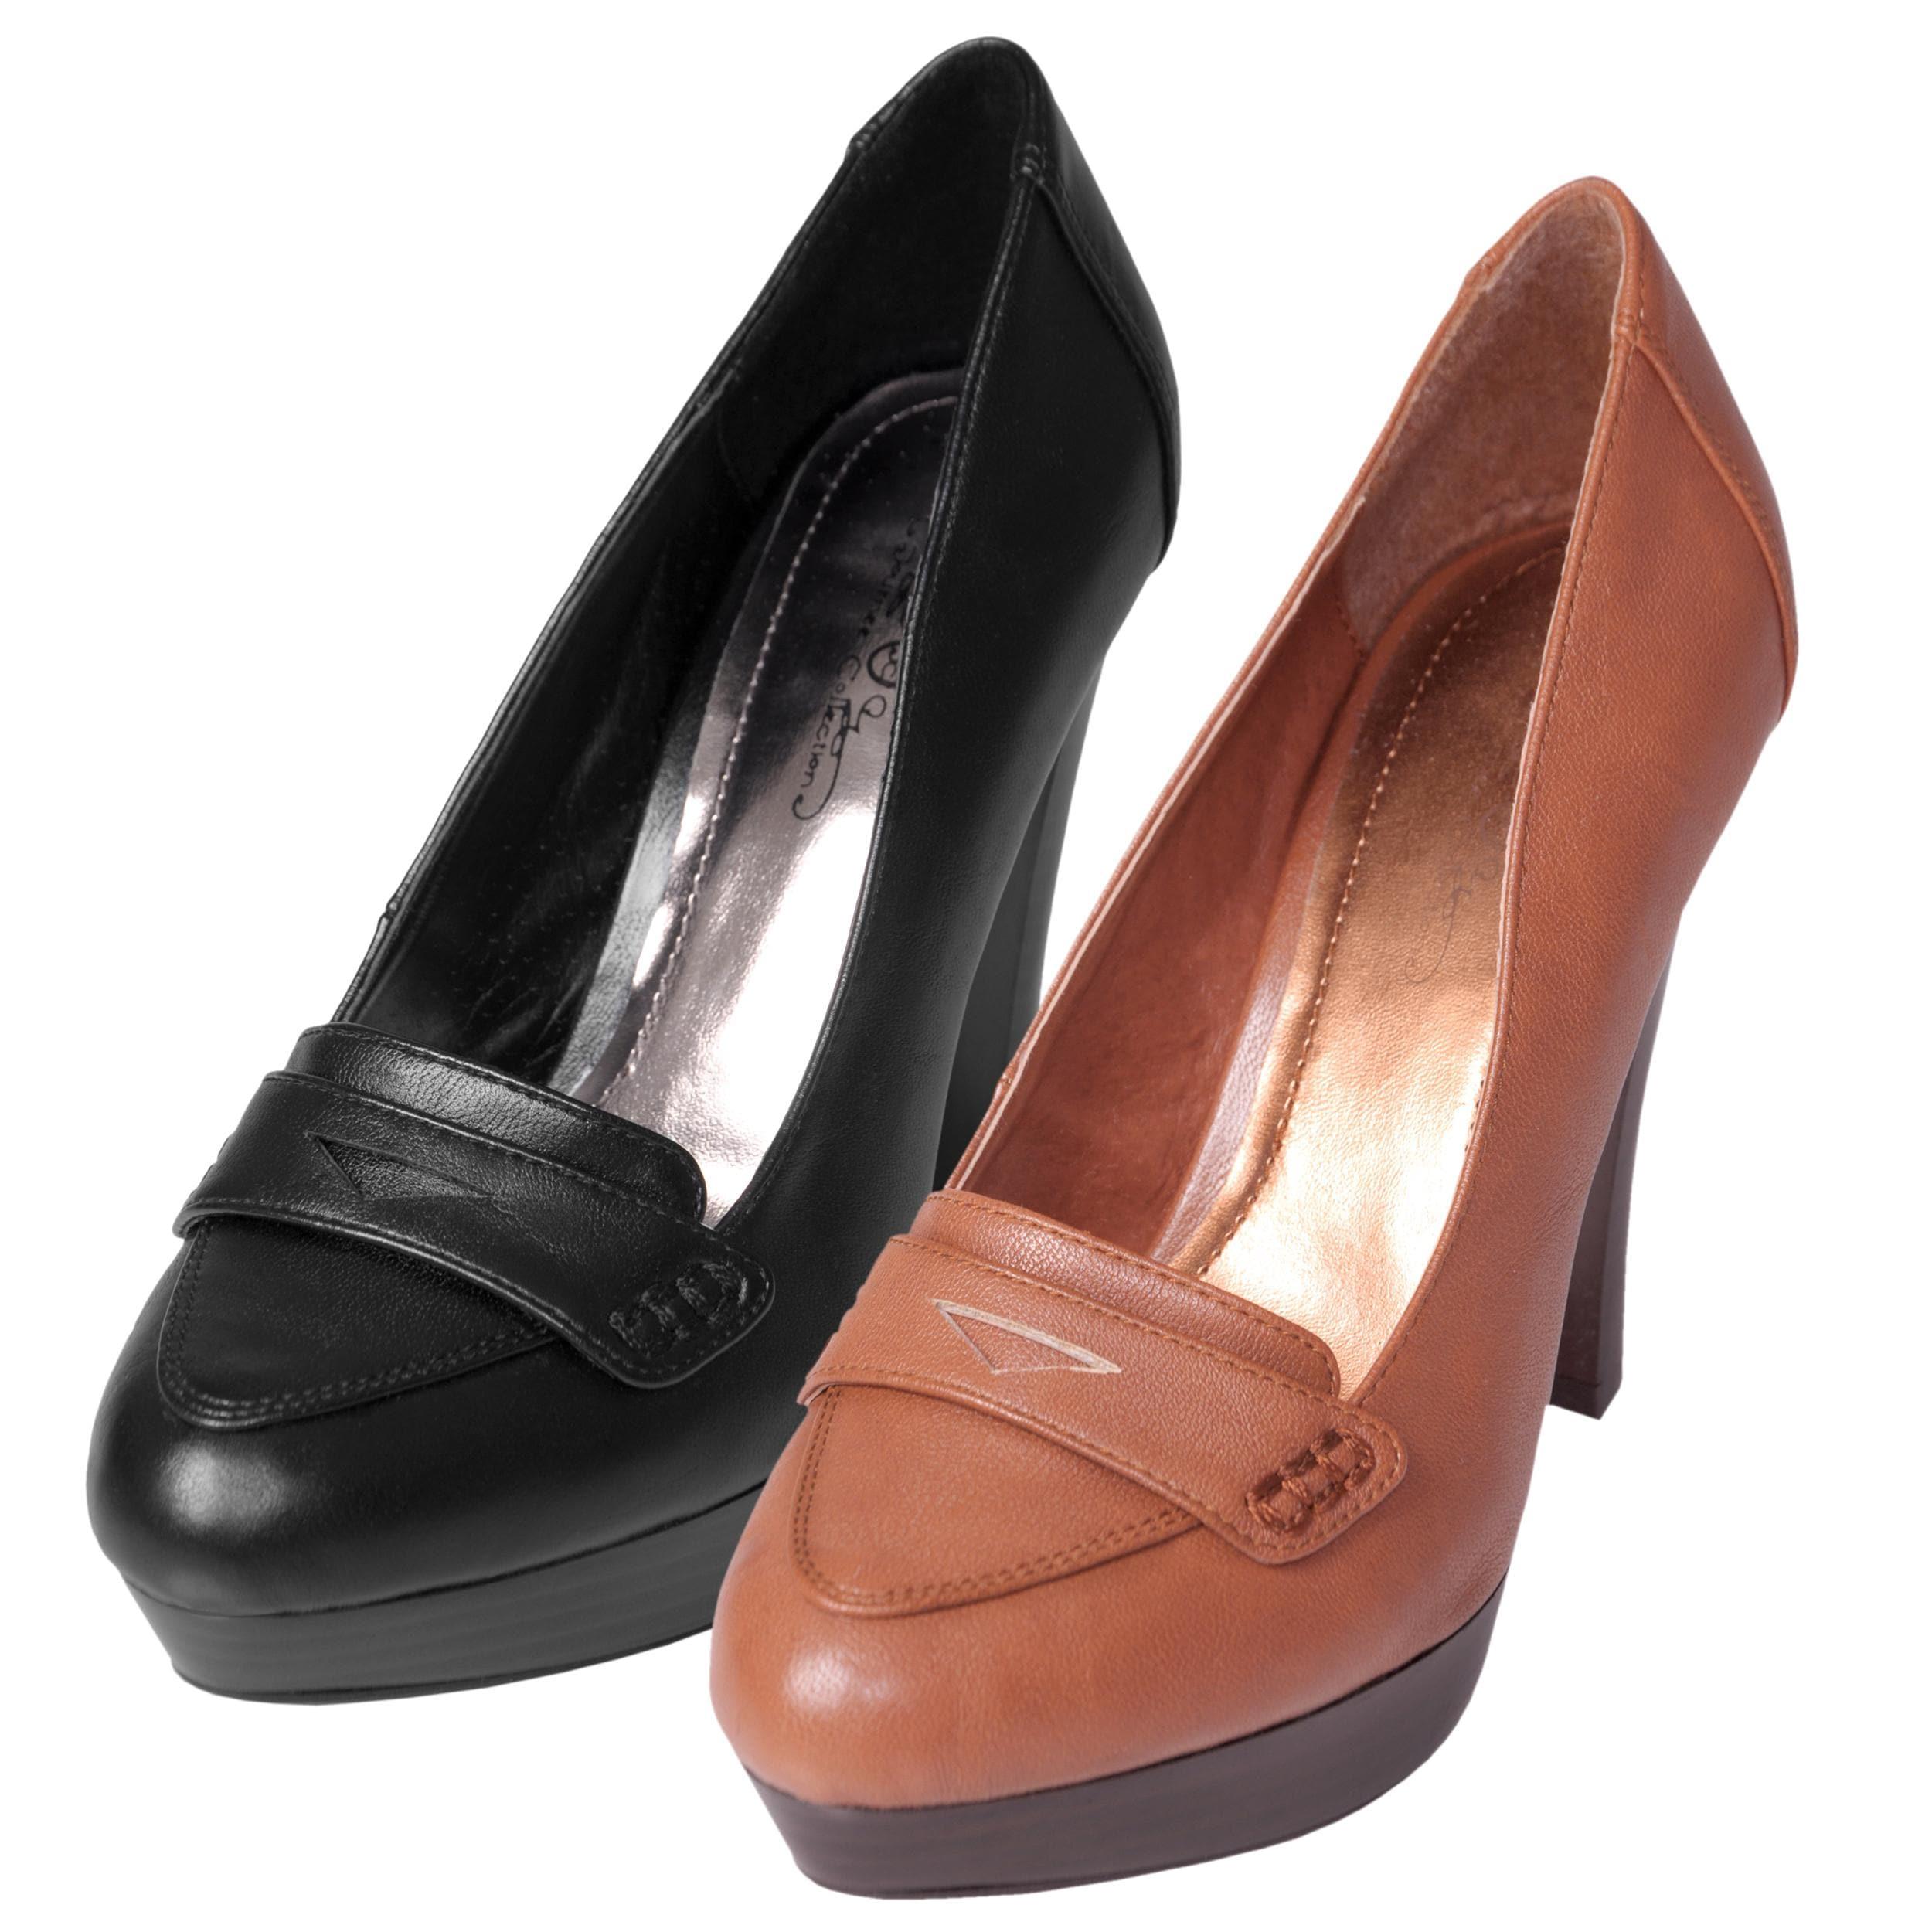 Journee Collection Women's 'Aurora-12' Heeled Loafers